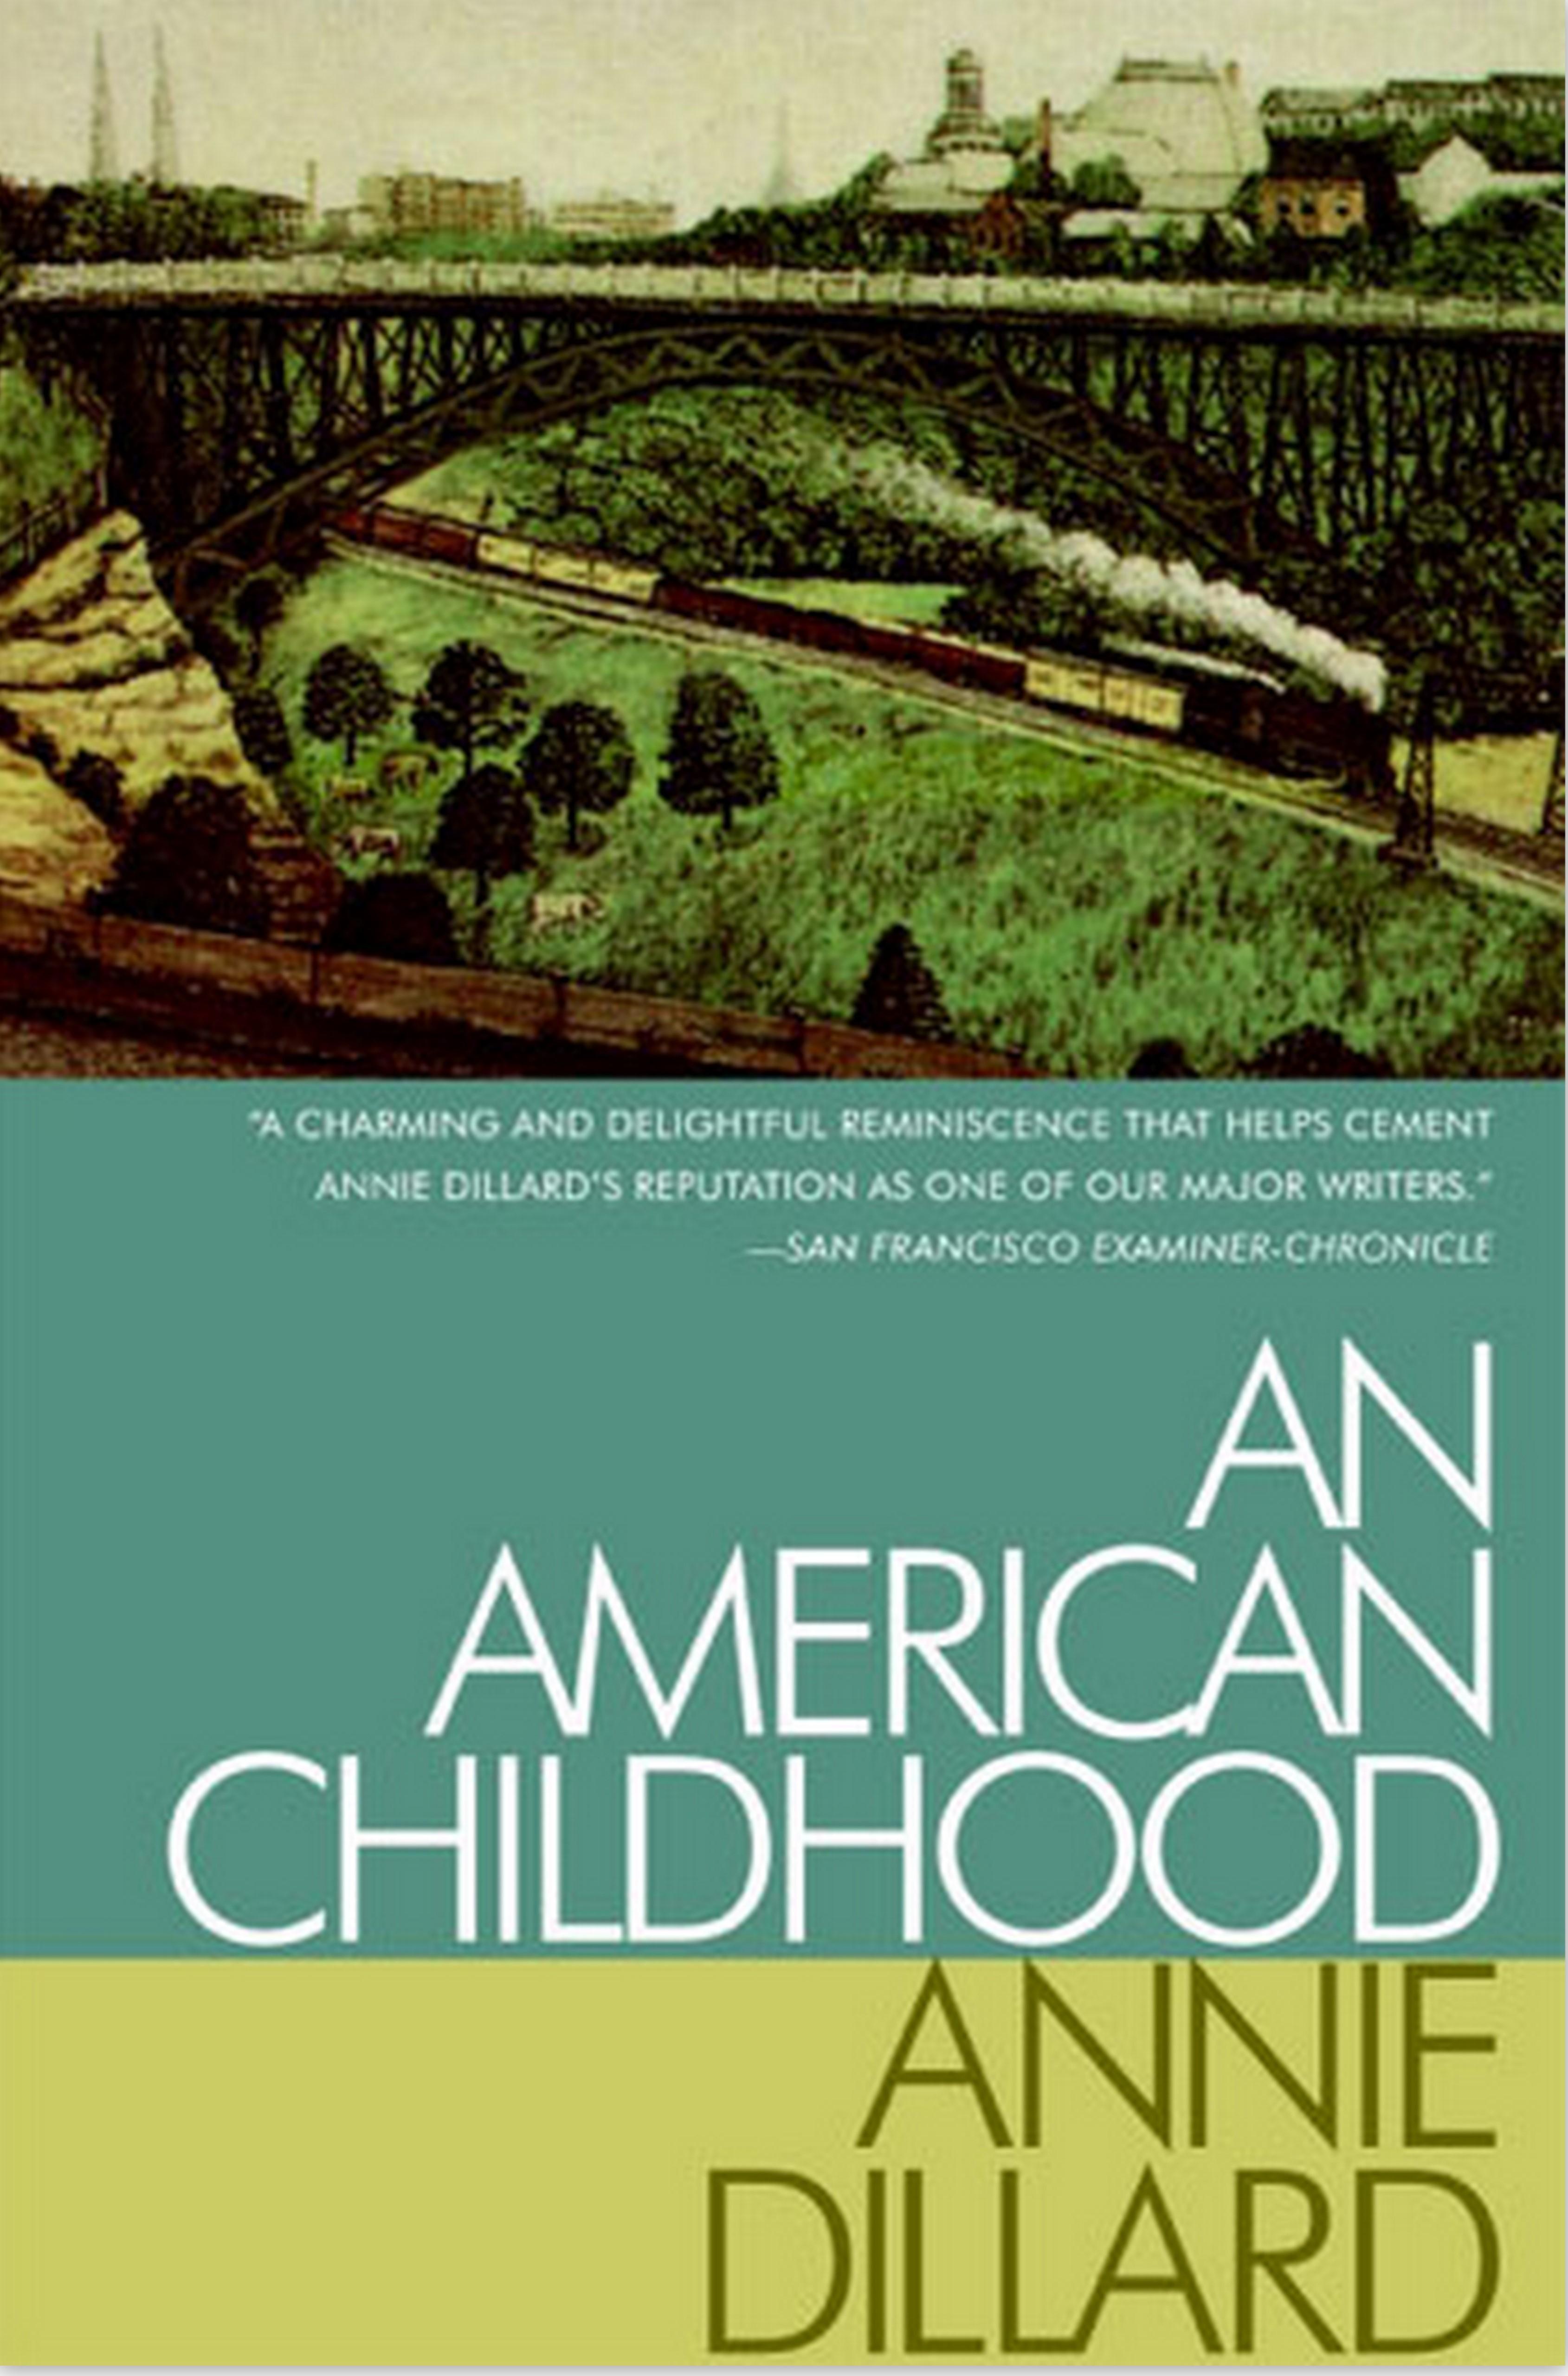 012 Annie Dillard An American Childhood Essays Essay Stirring Stunt Pilot Pdf Full